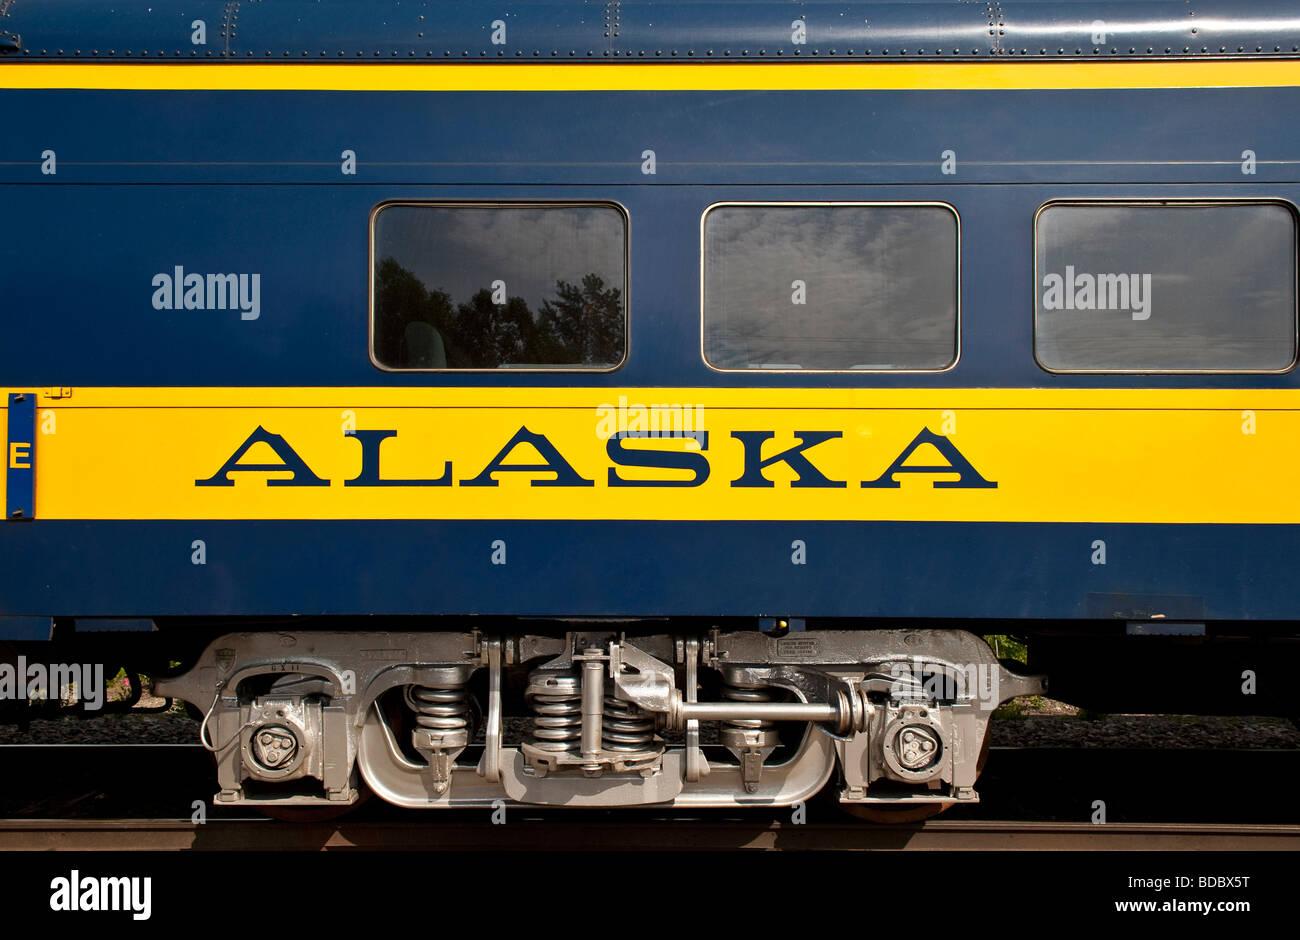 Alaska railroad train car - Stock Image